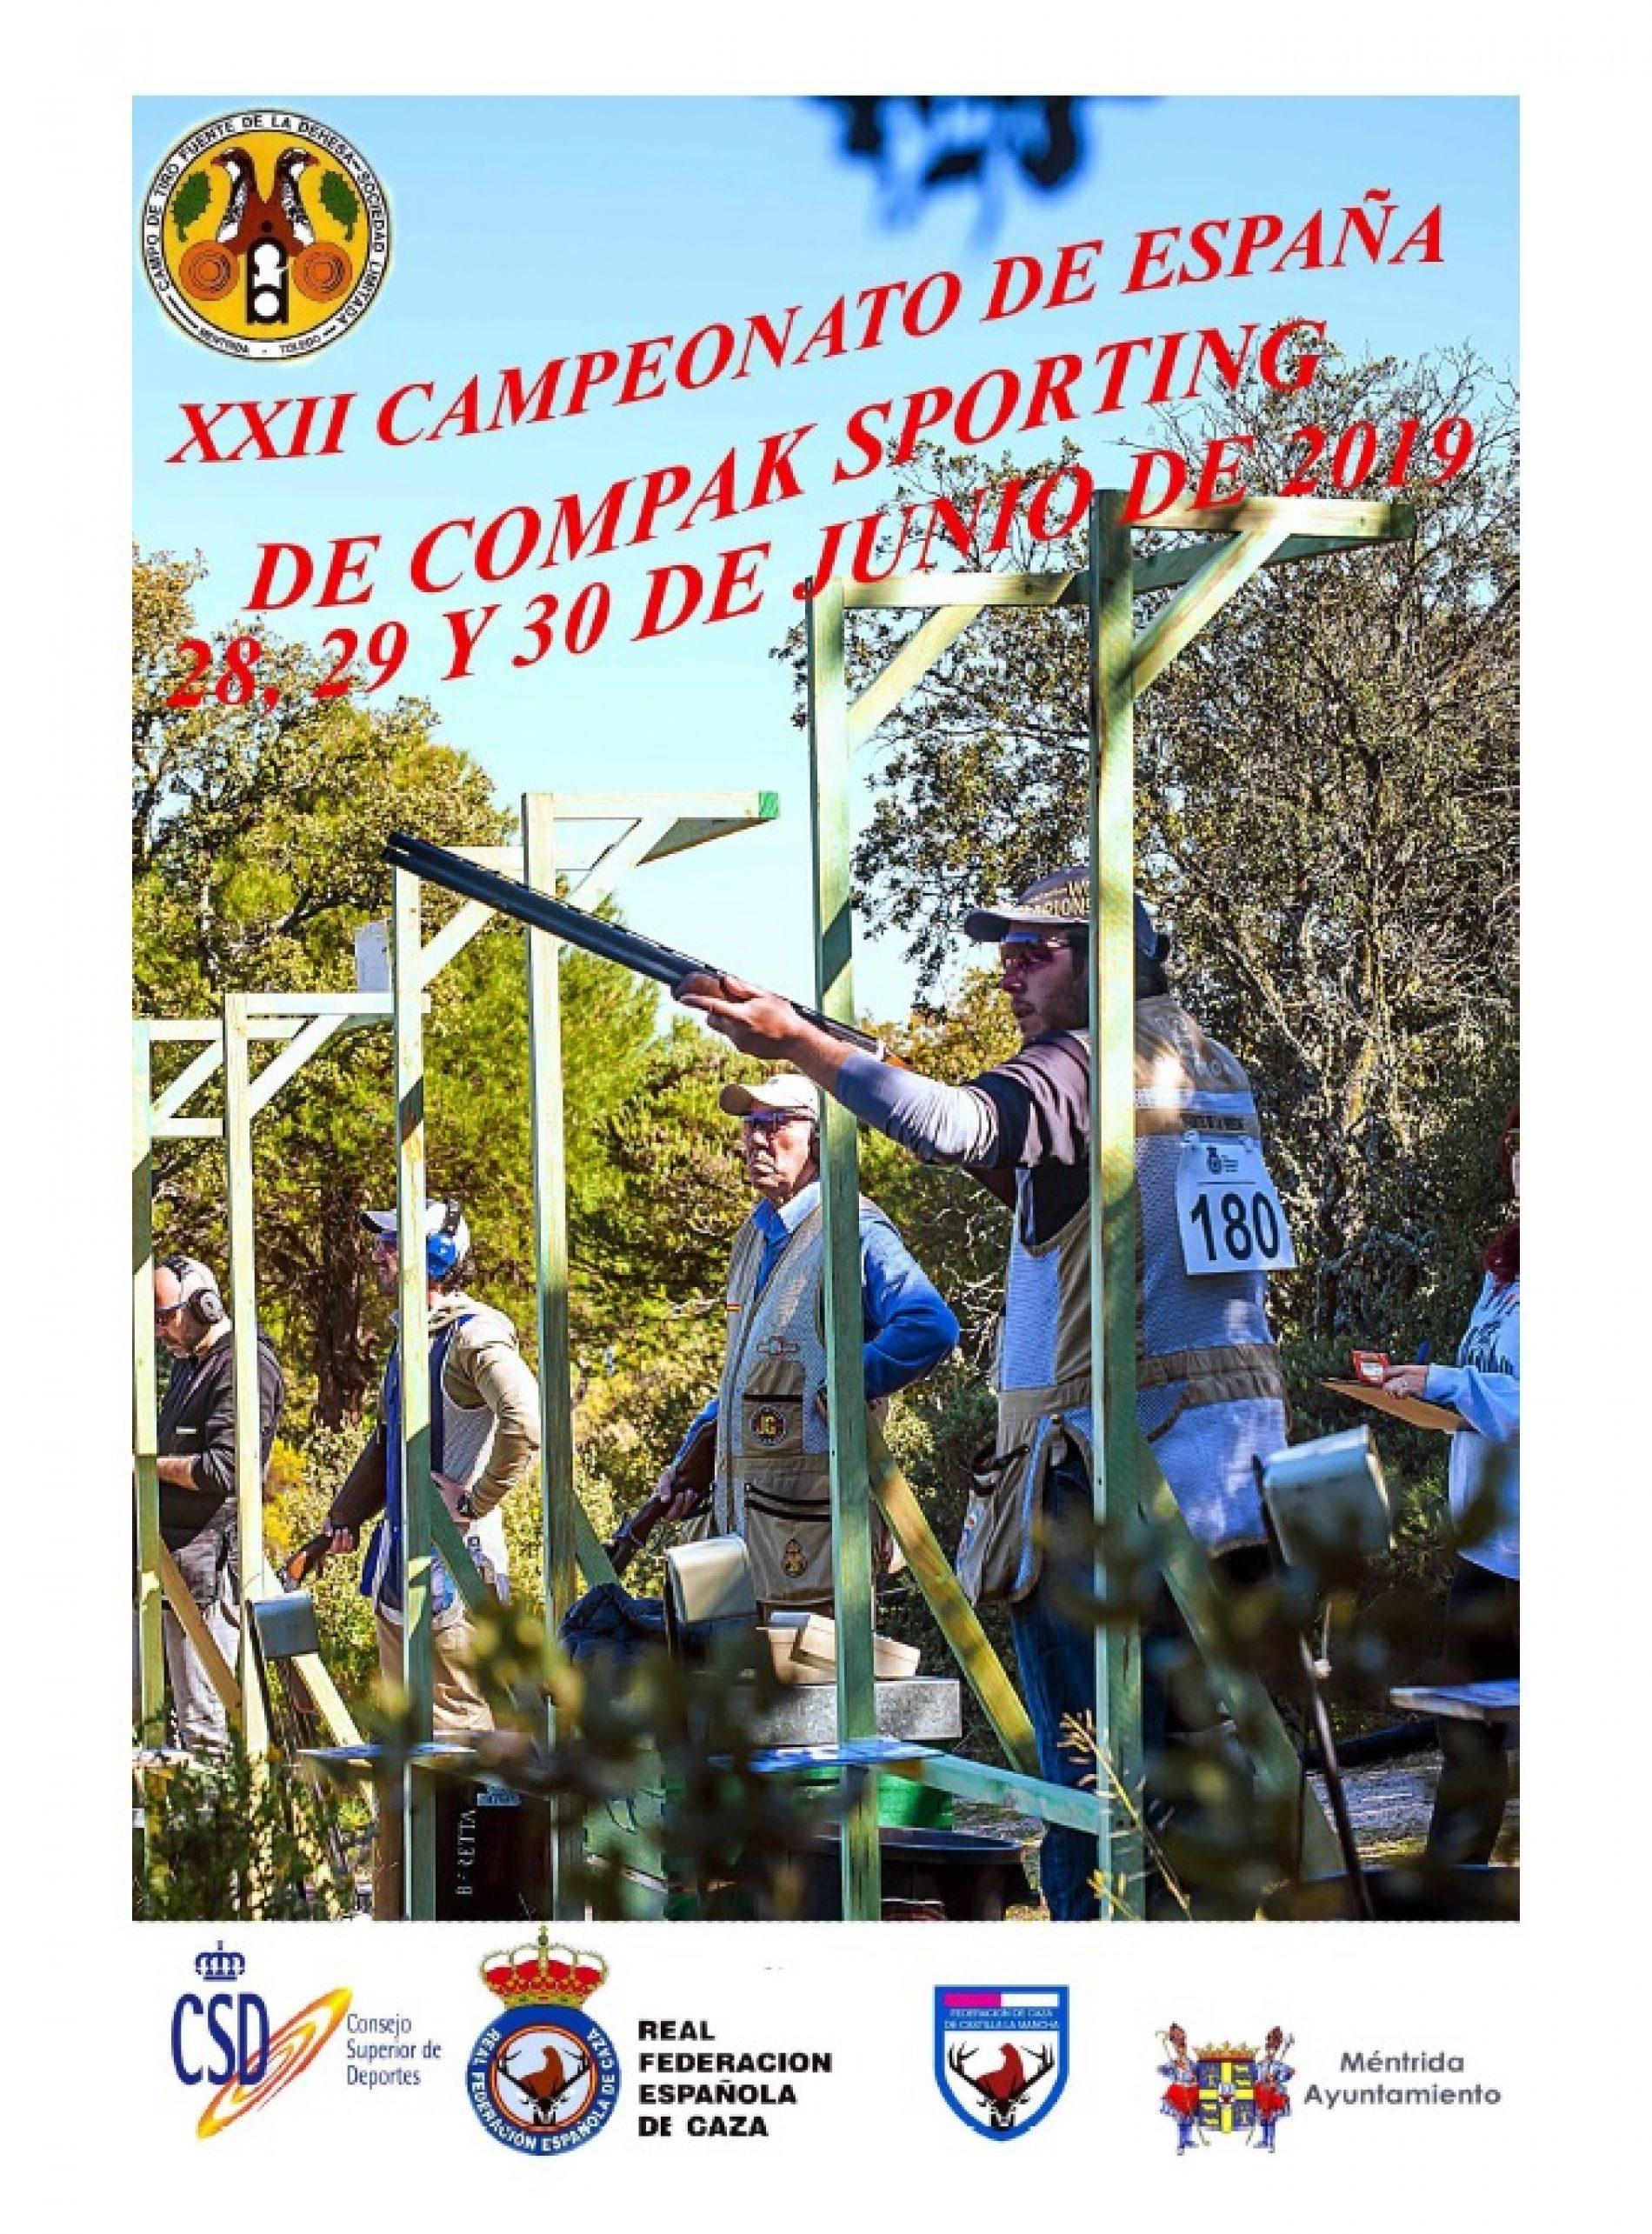 XXII Campeonato de España de Compak Sporting